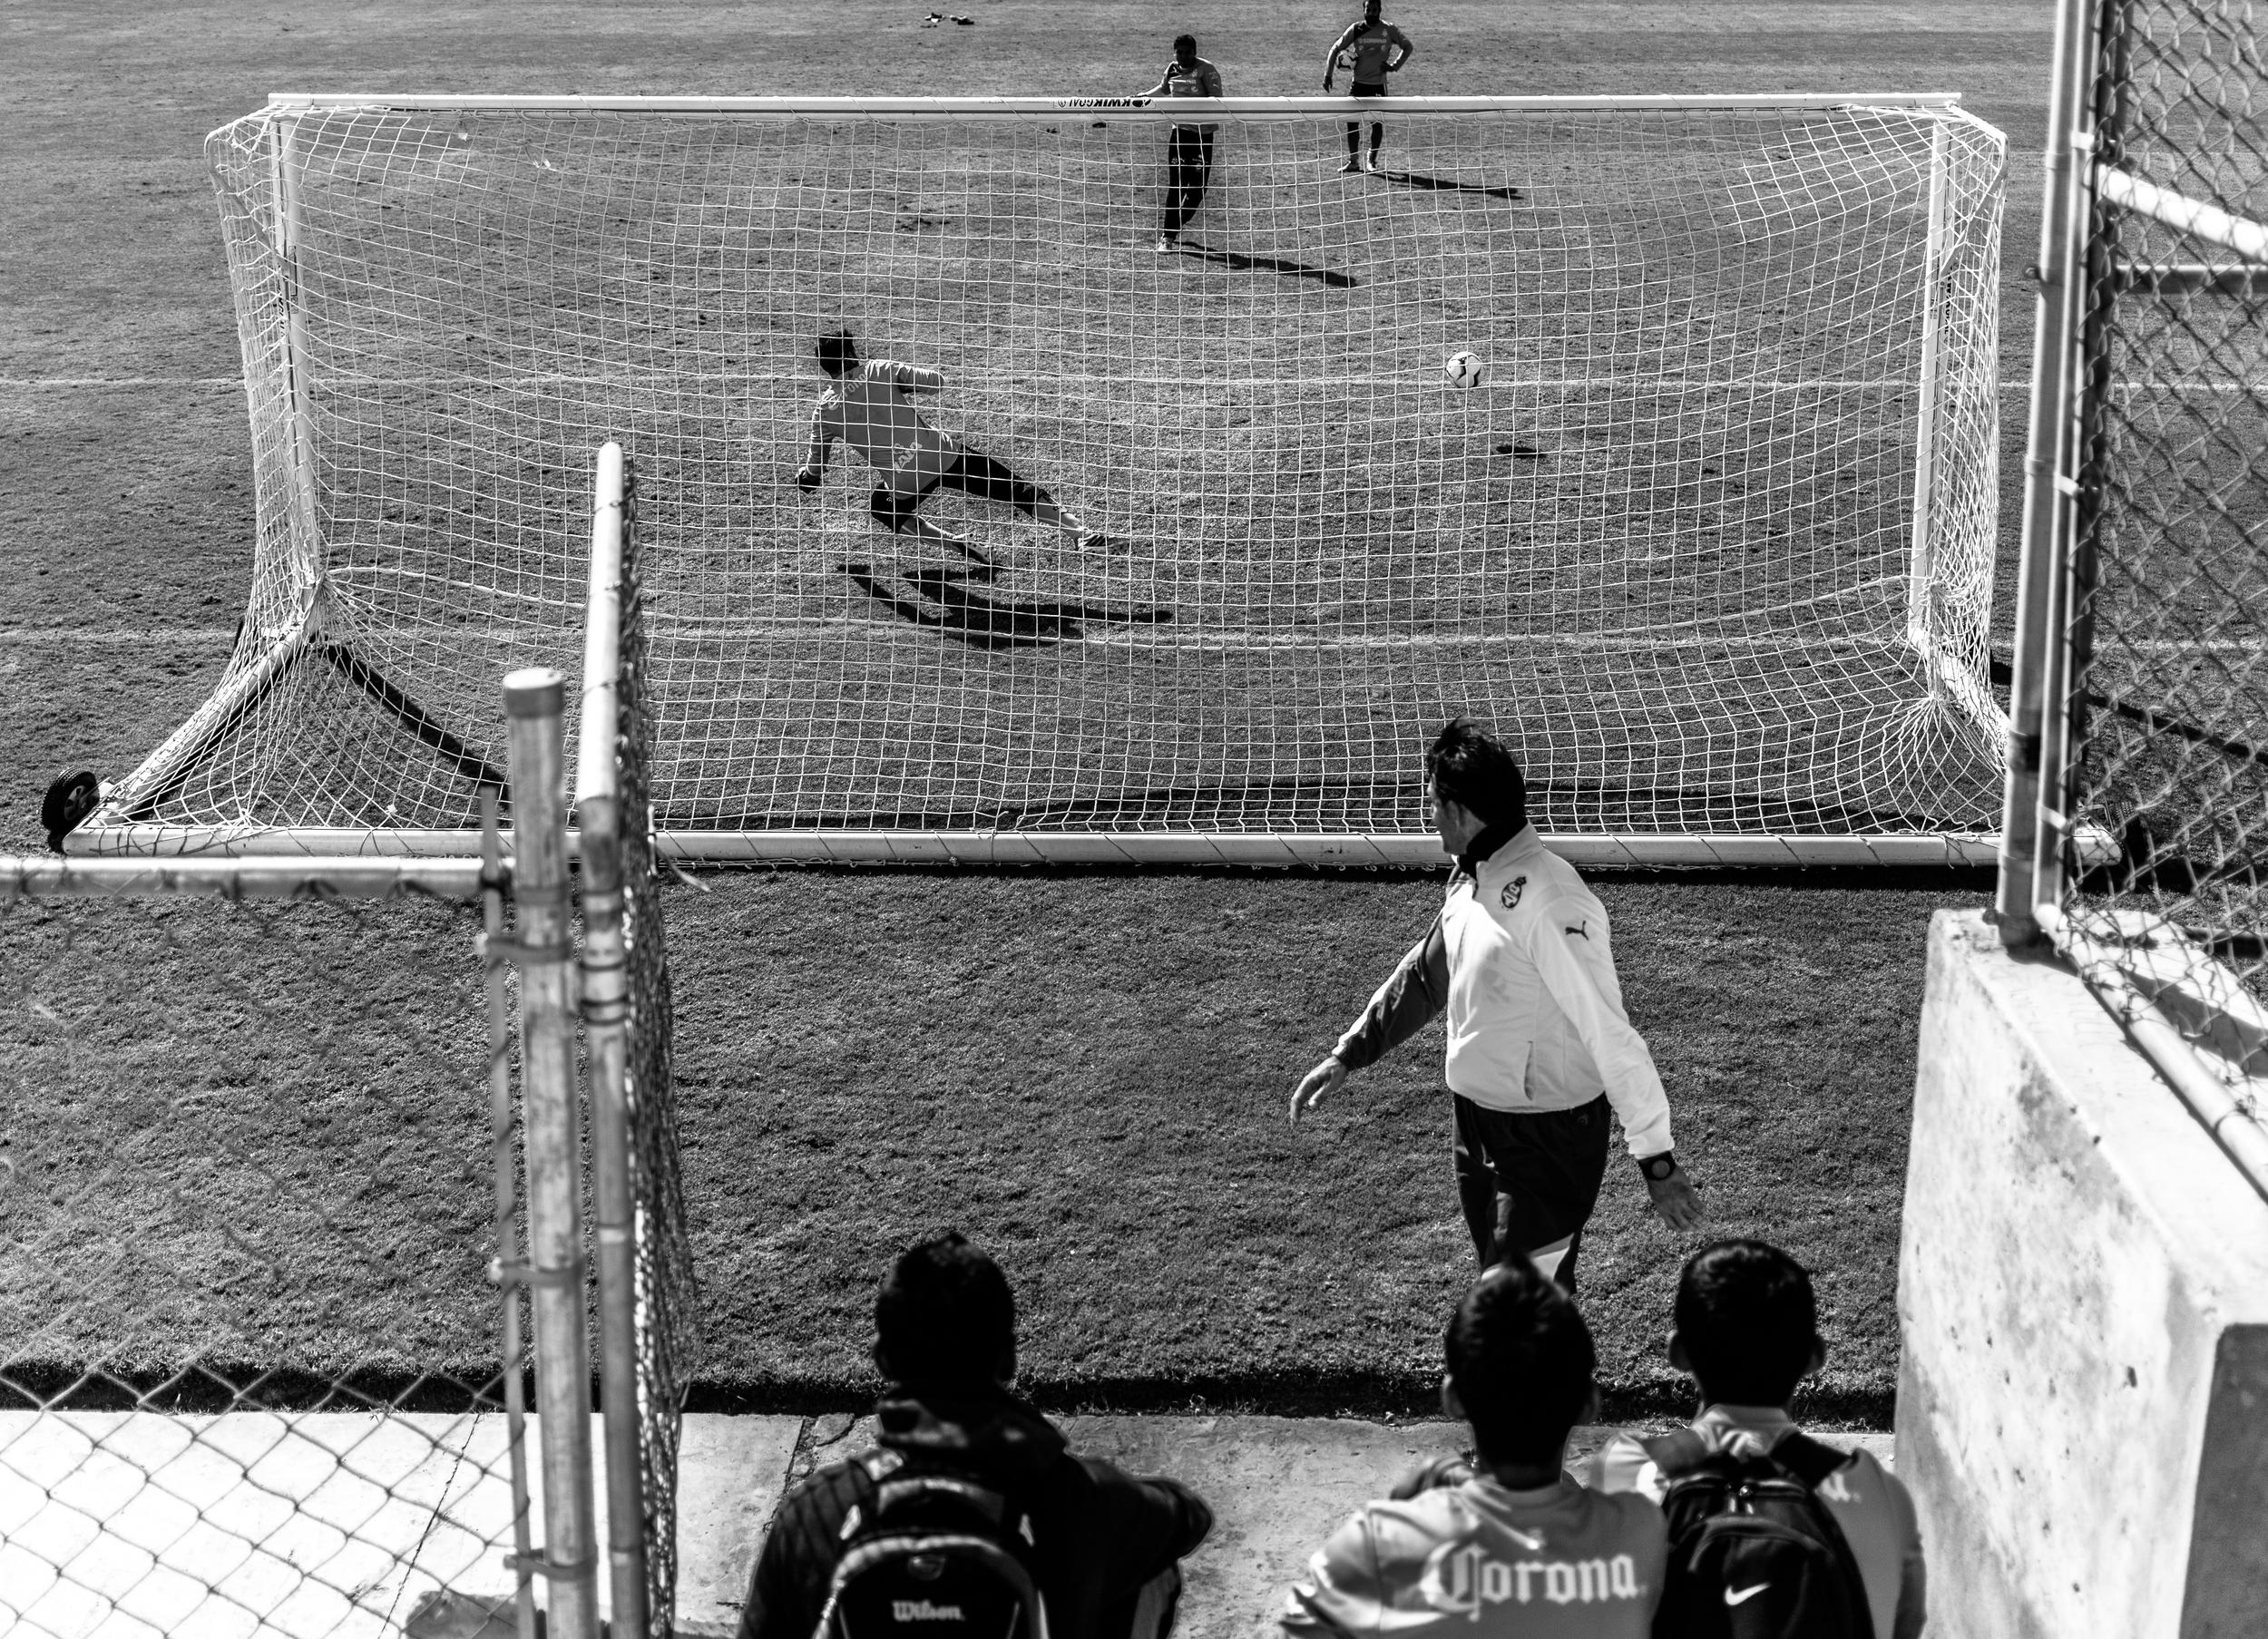 Santos_Laguna_Training_(22_of_23).jpg